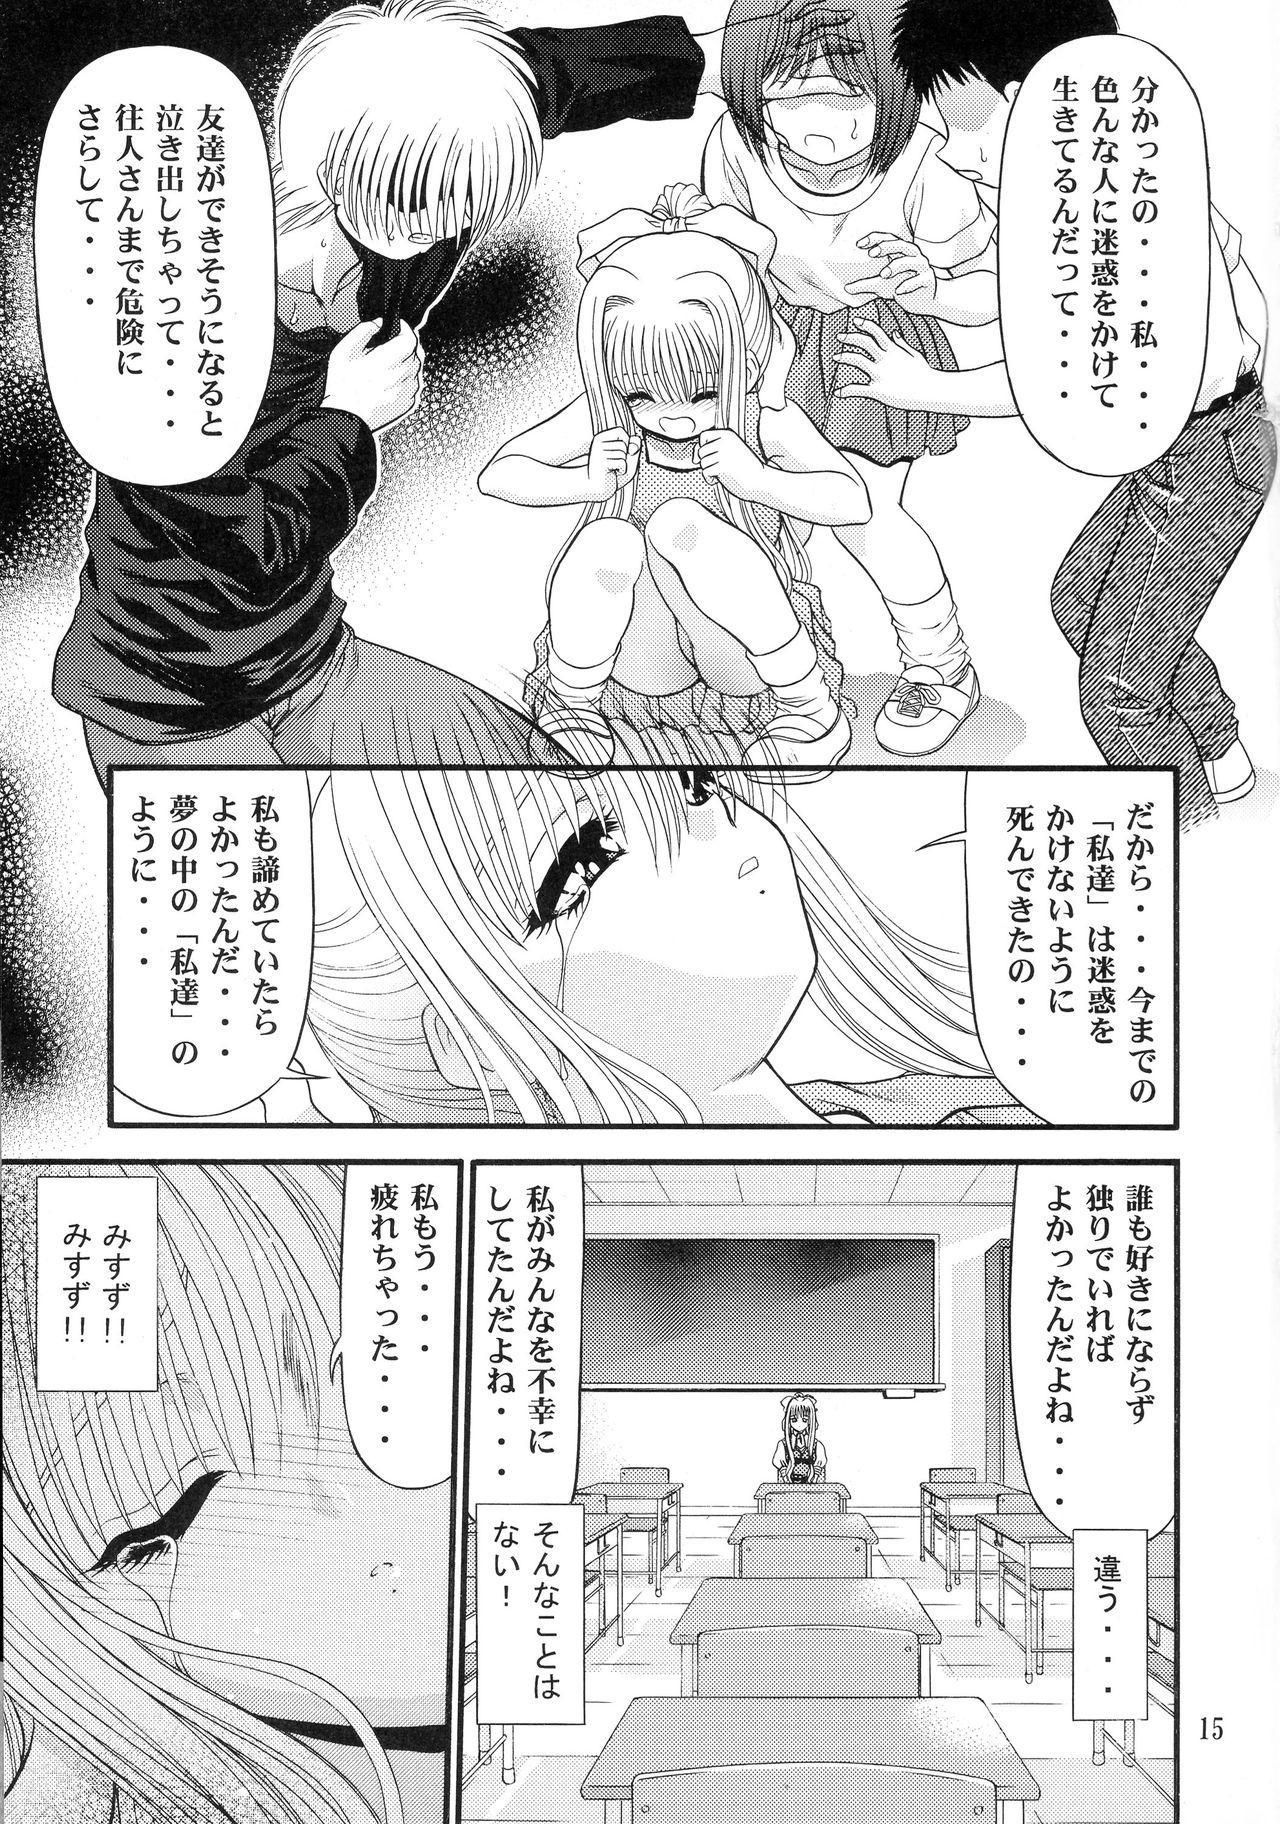 BLUE BLOOD'S Vol.9 13